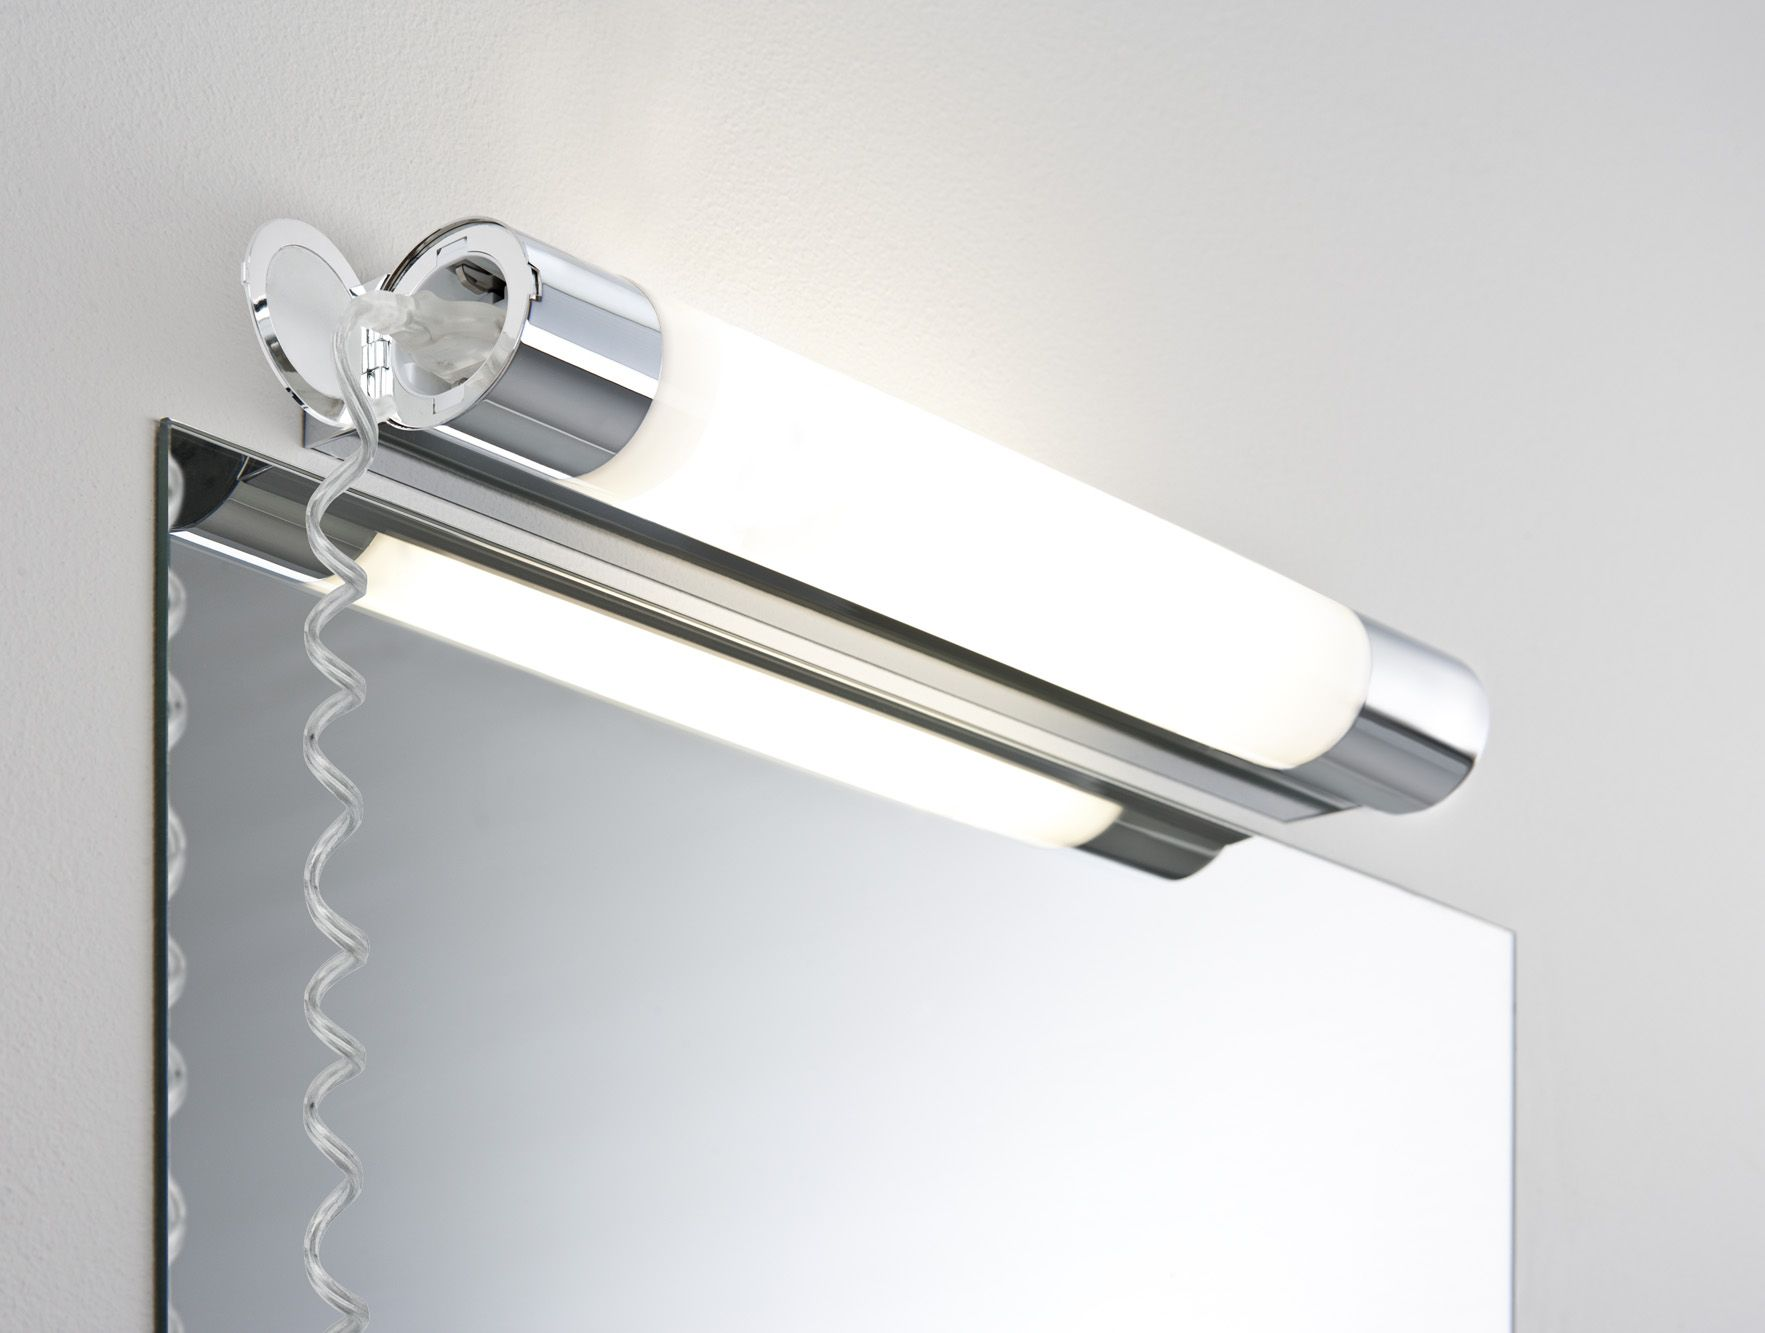 Badkamer spiegellamp met stopcontact project foto 39 s for Applique salle de bain avec prise de courant